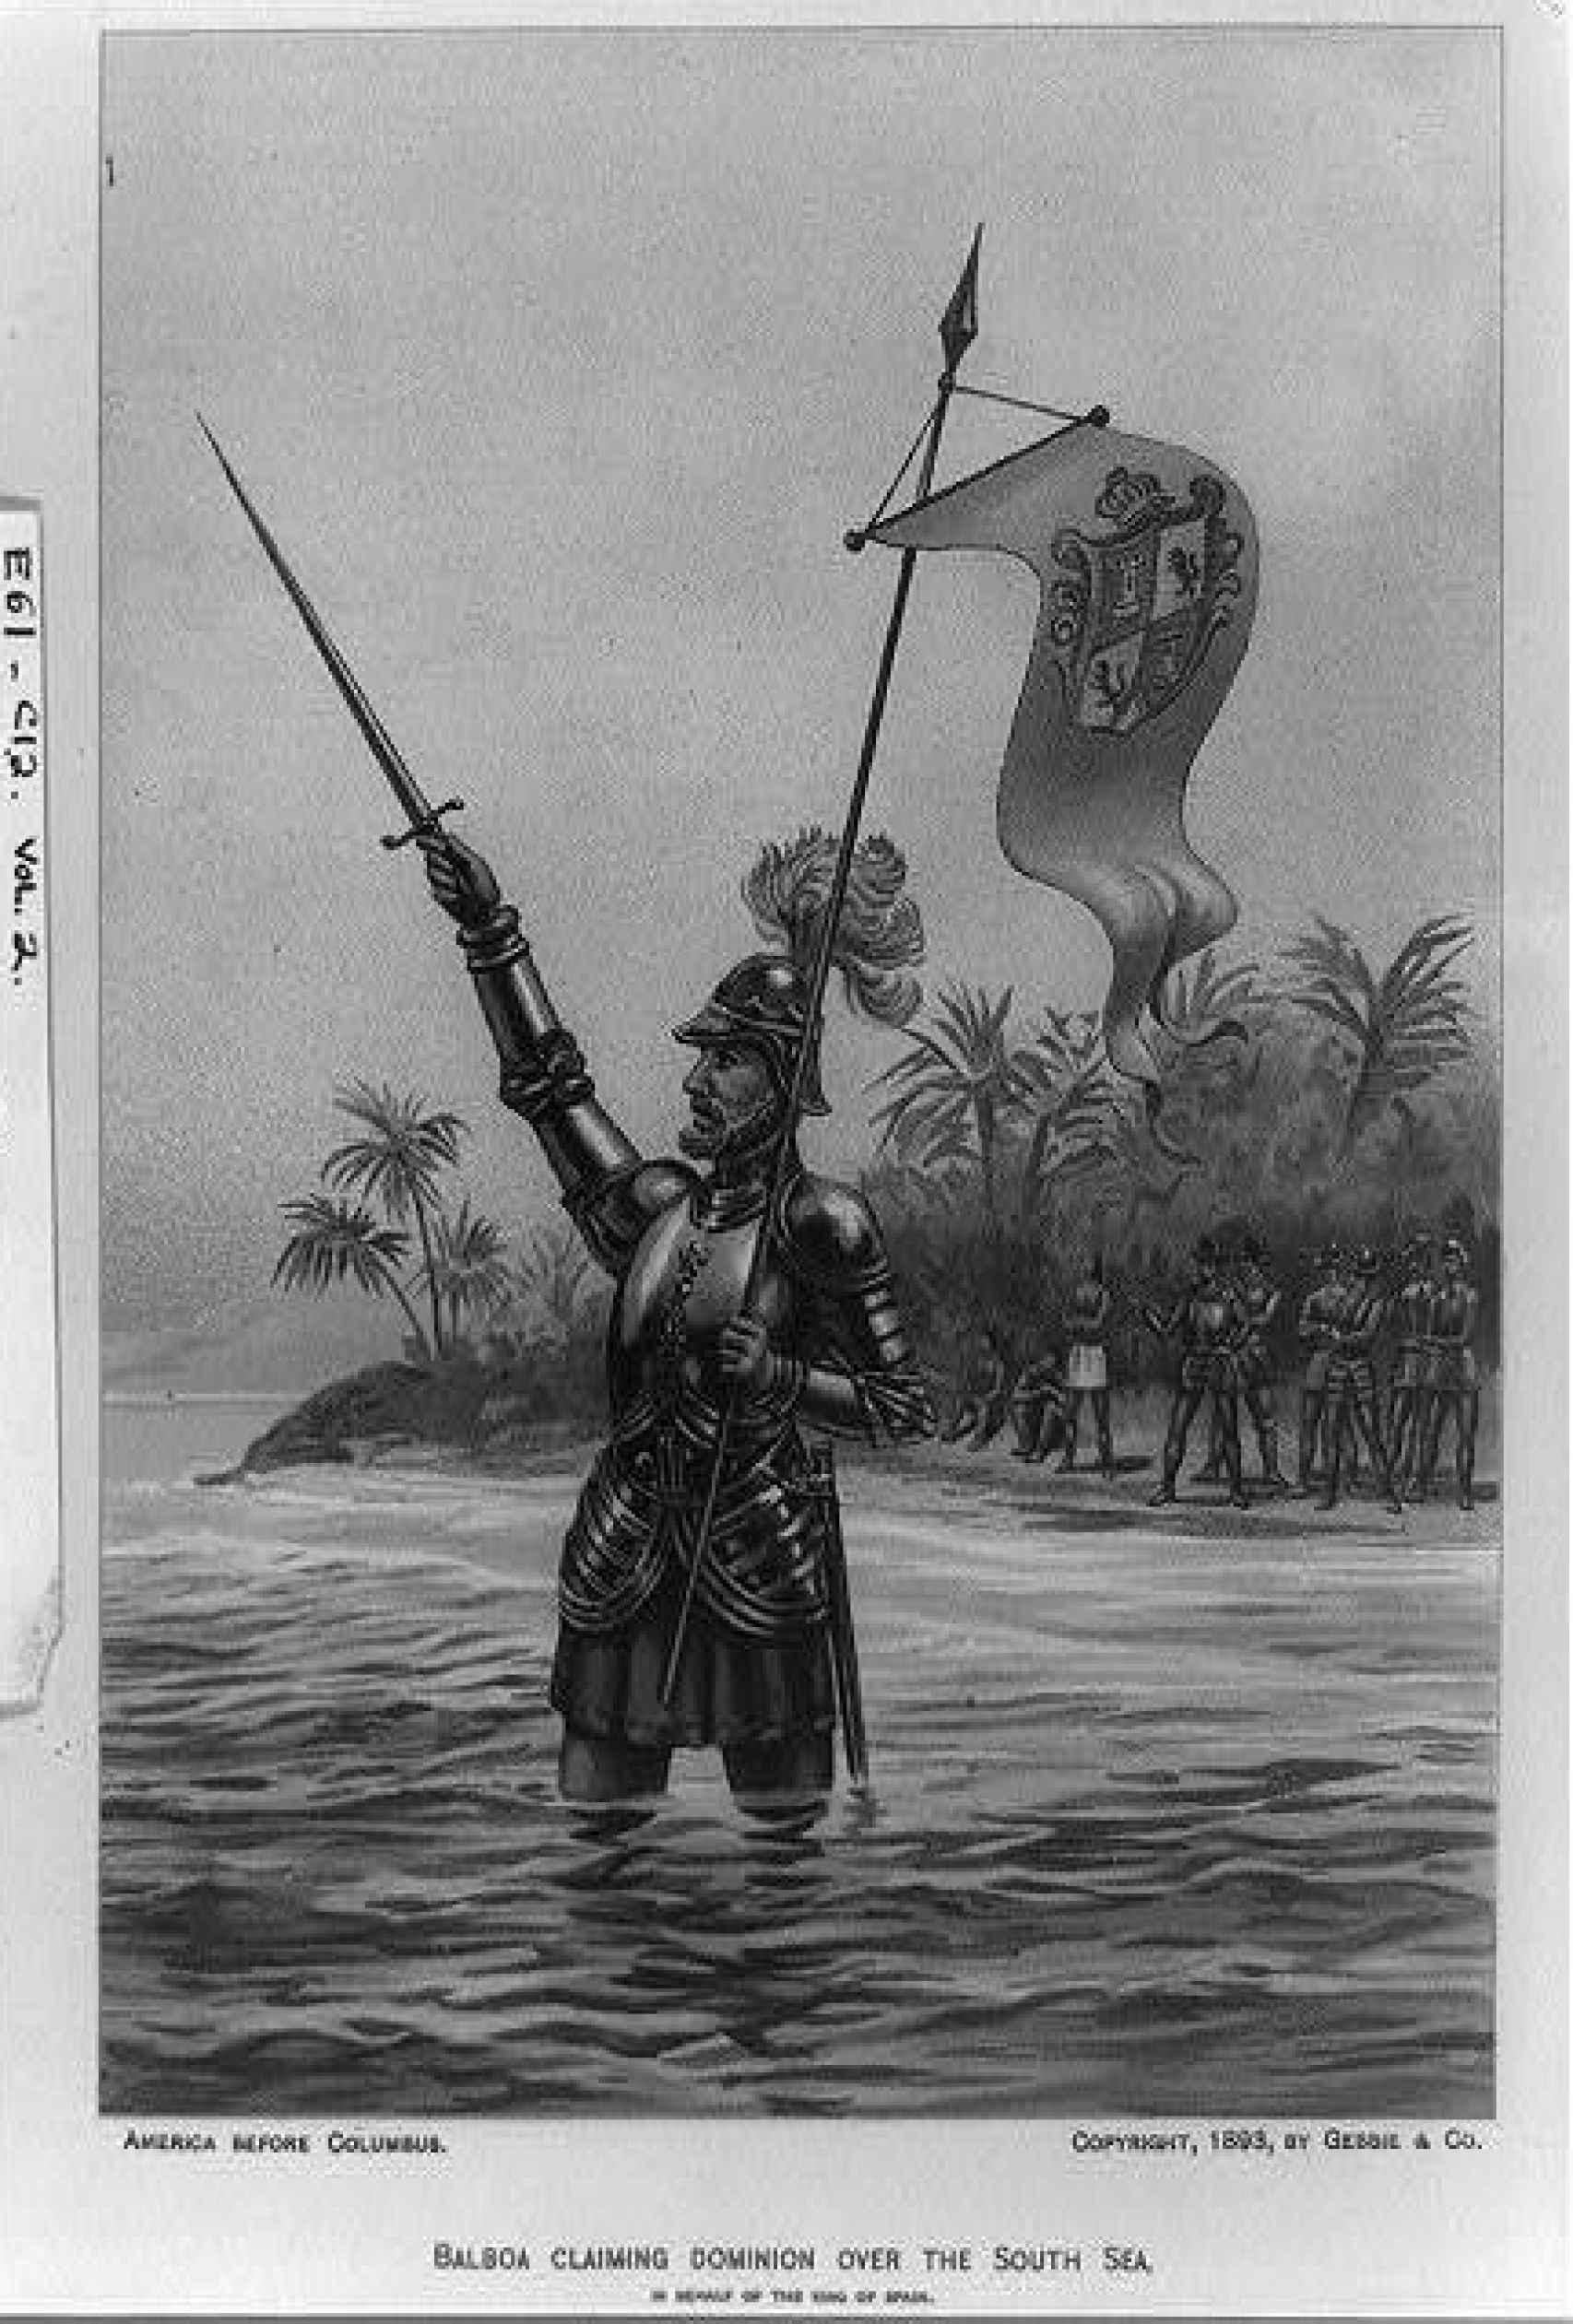 Vasco Núñez de Balboa tomando posesión del Mar del Sur.